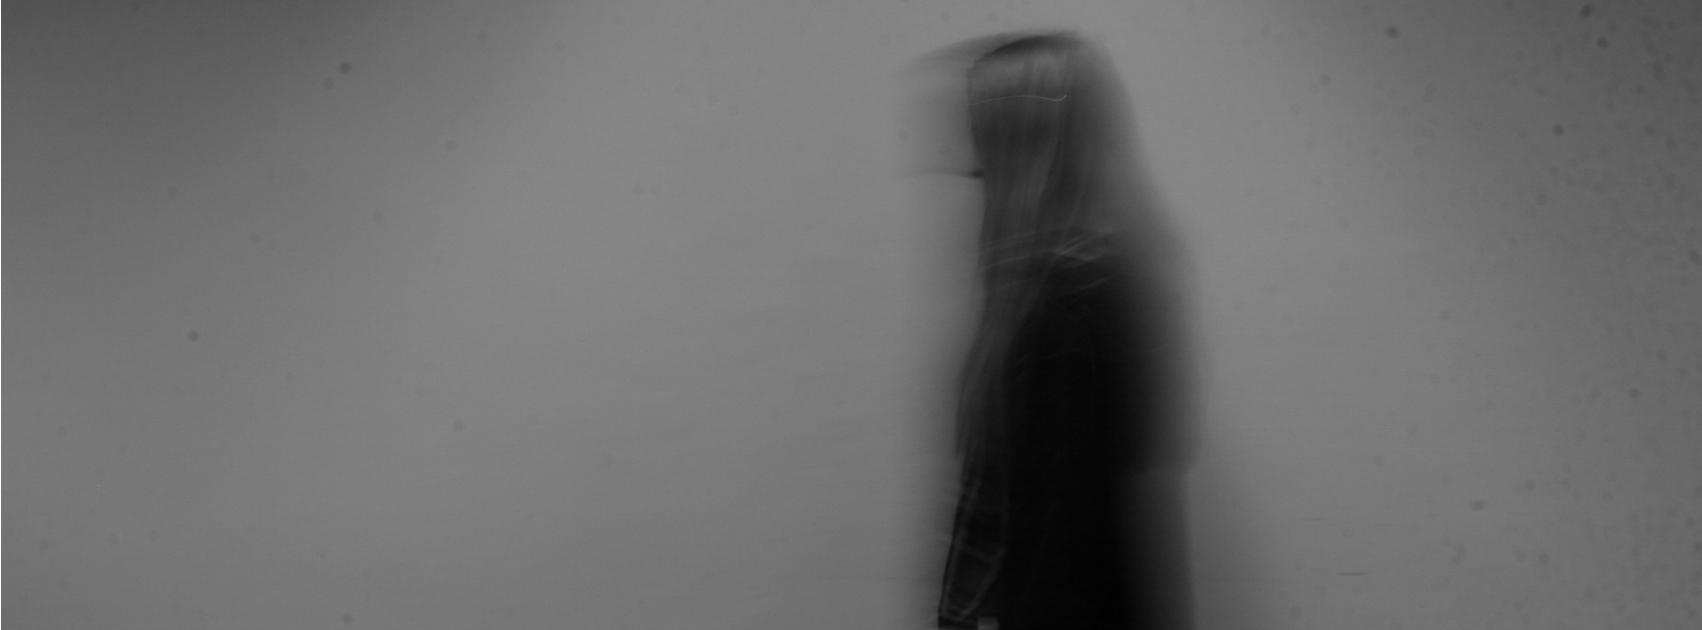 ensomhet-generell